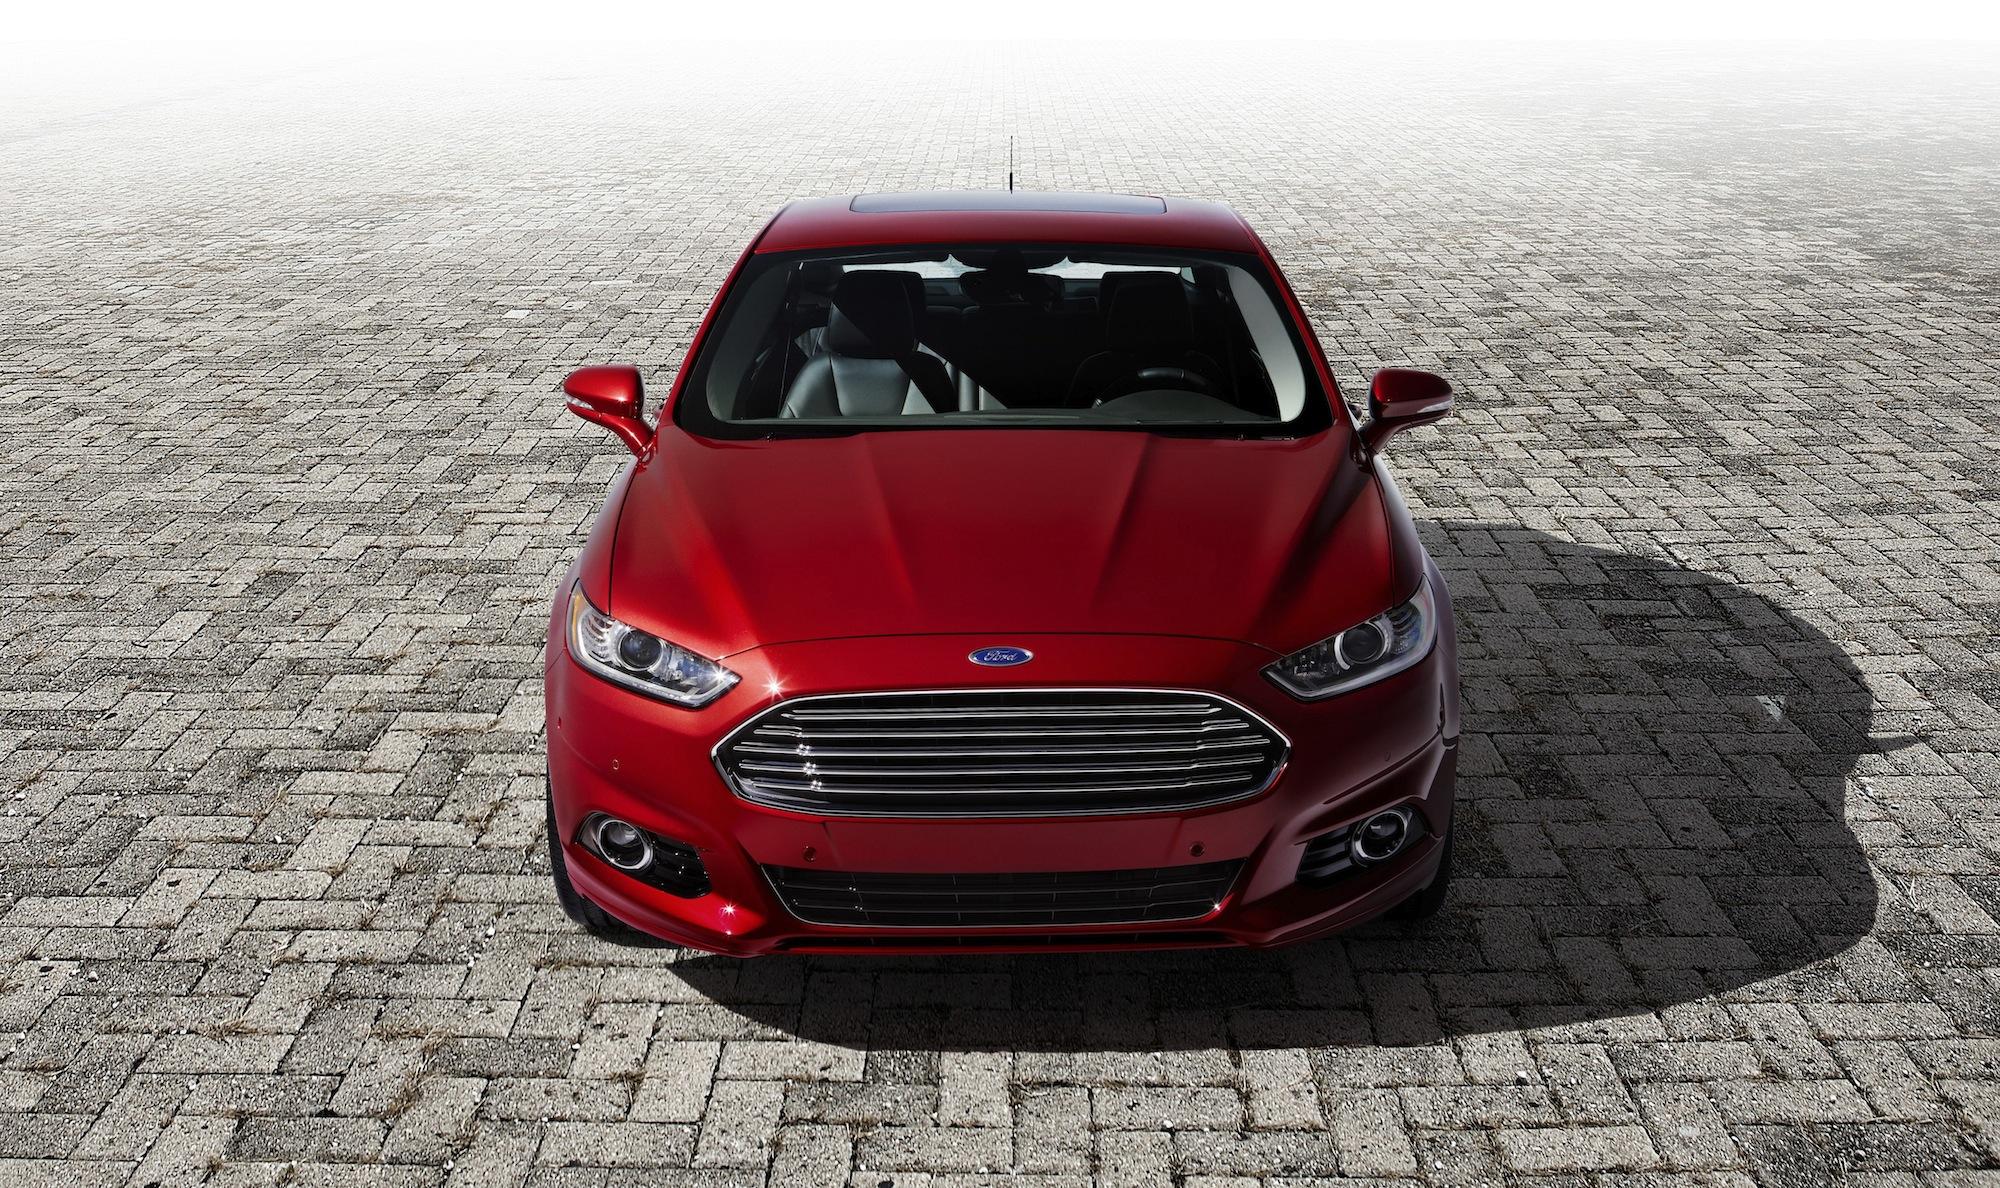 Win A 2013 Ford Fusion Or 2013 Ford Escape In The Winter